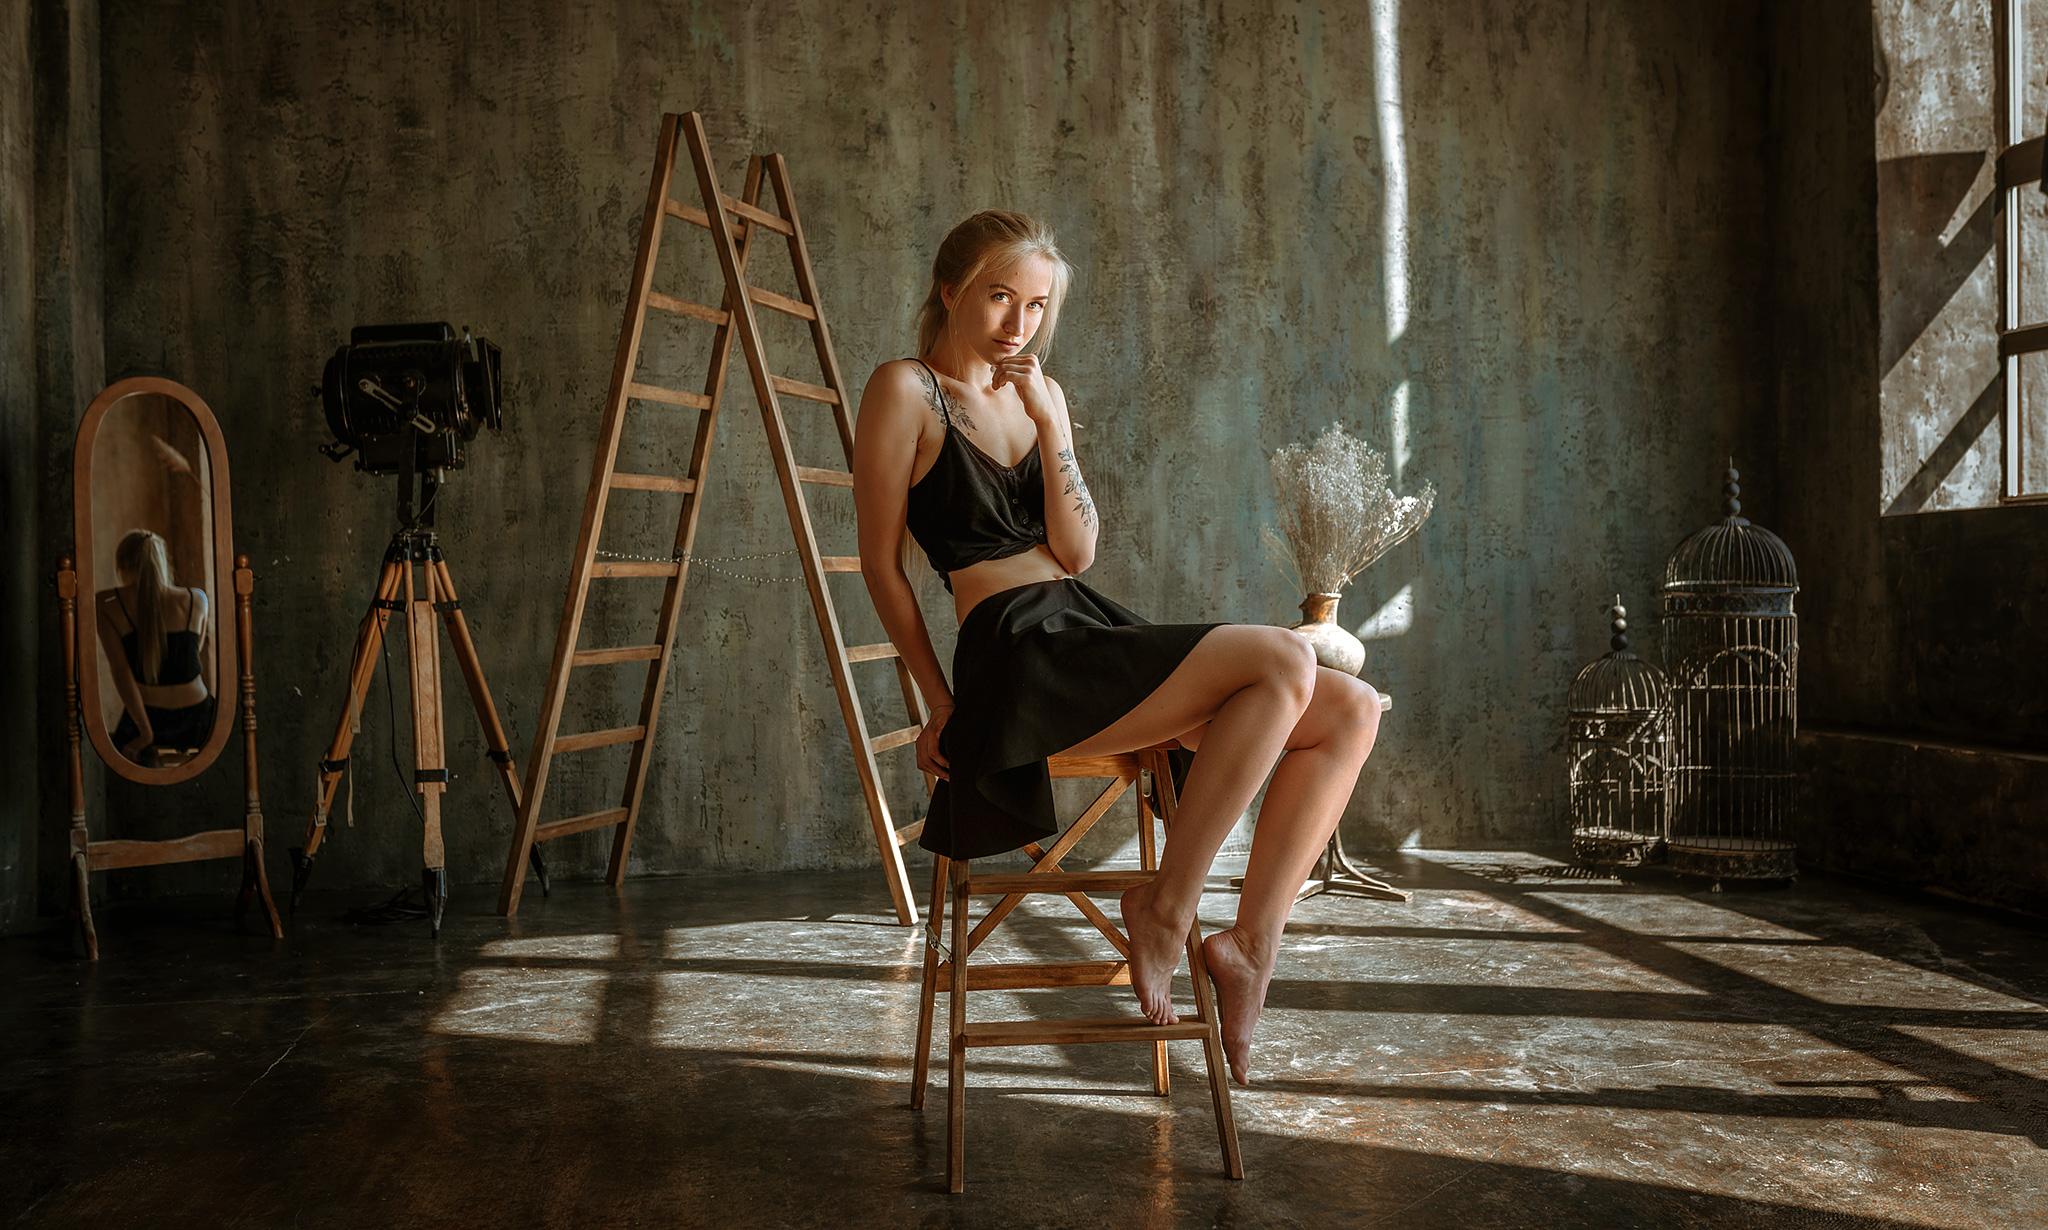 Women Model Blonde Looking At Viewer Black Tops Sitting Black Clothing Barefoot Stairs Mirror Reflec 2048x1230